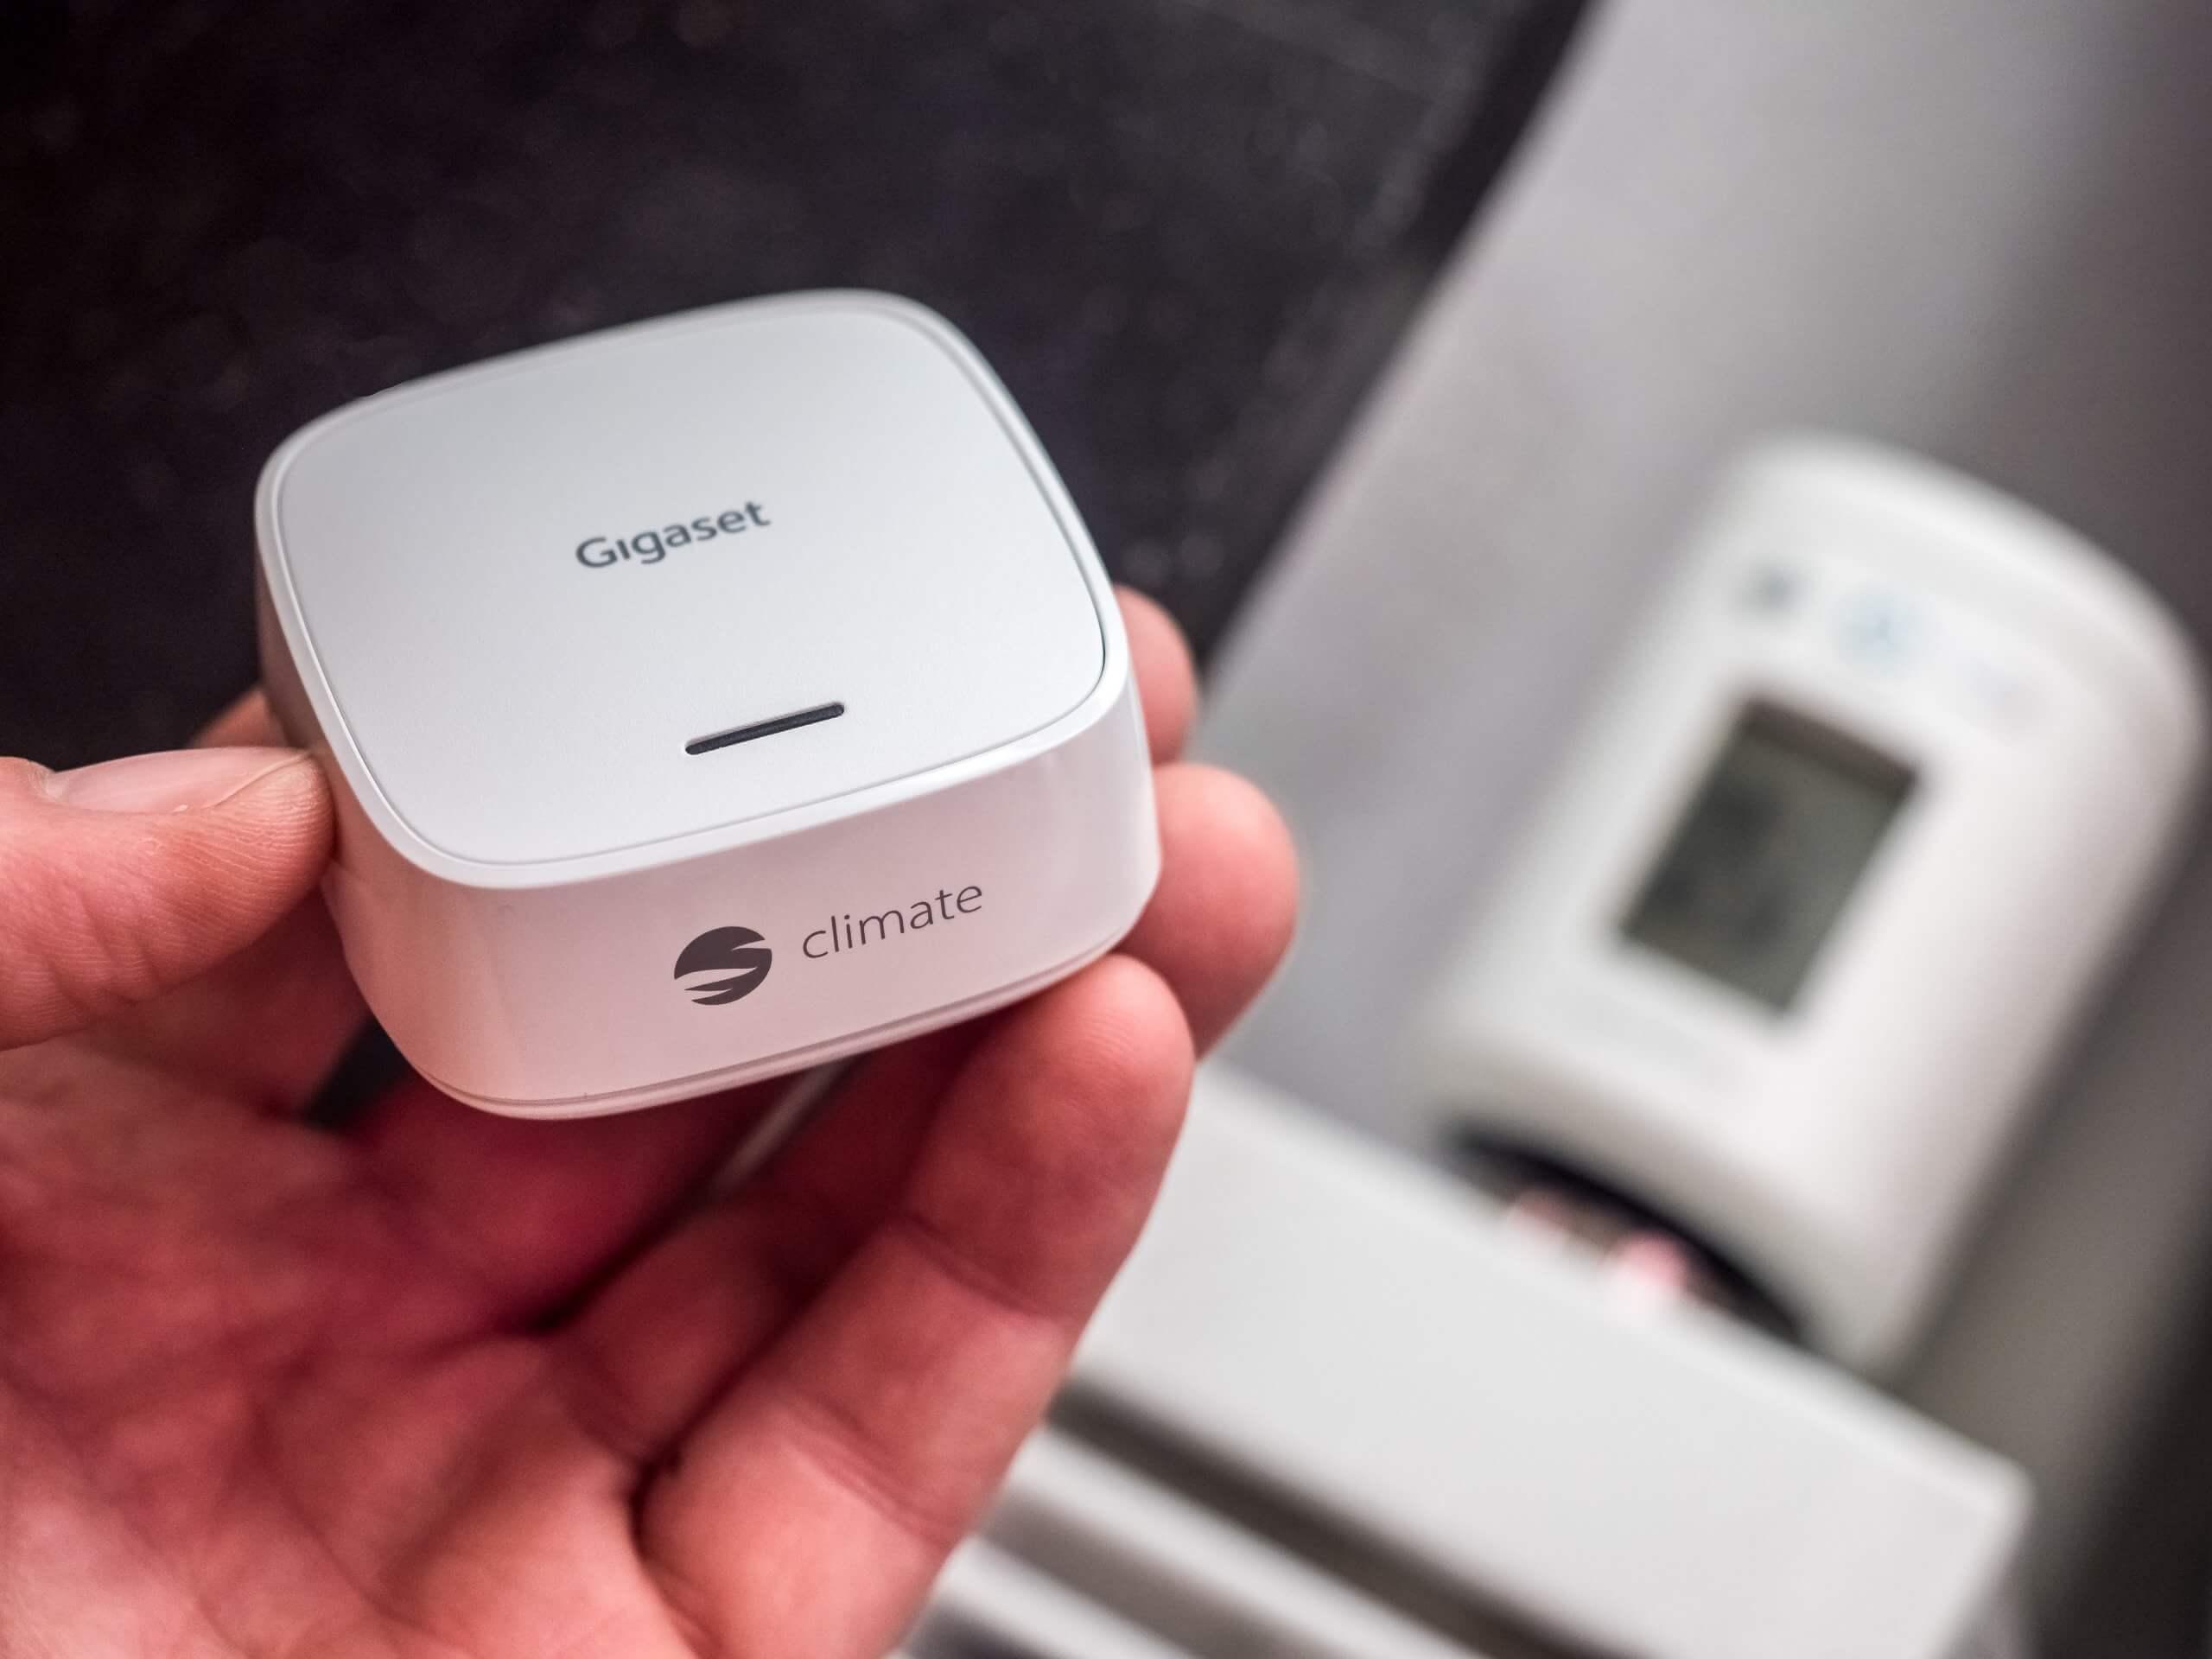 Gigaset Climate mit Gigaset Smart Thermostat